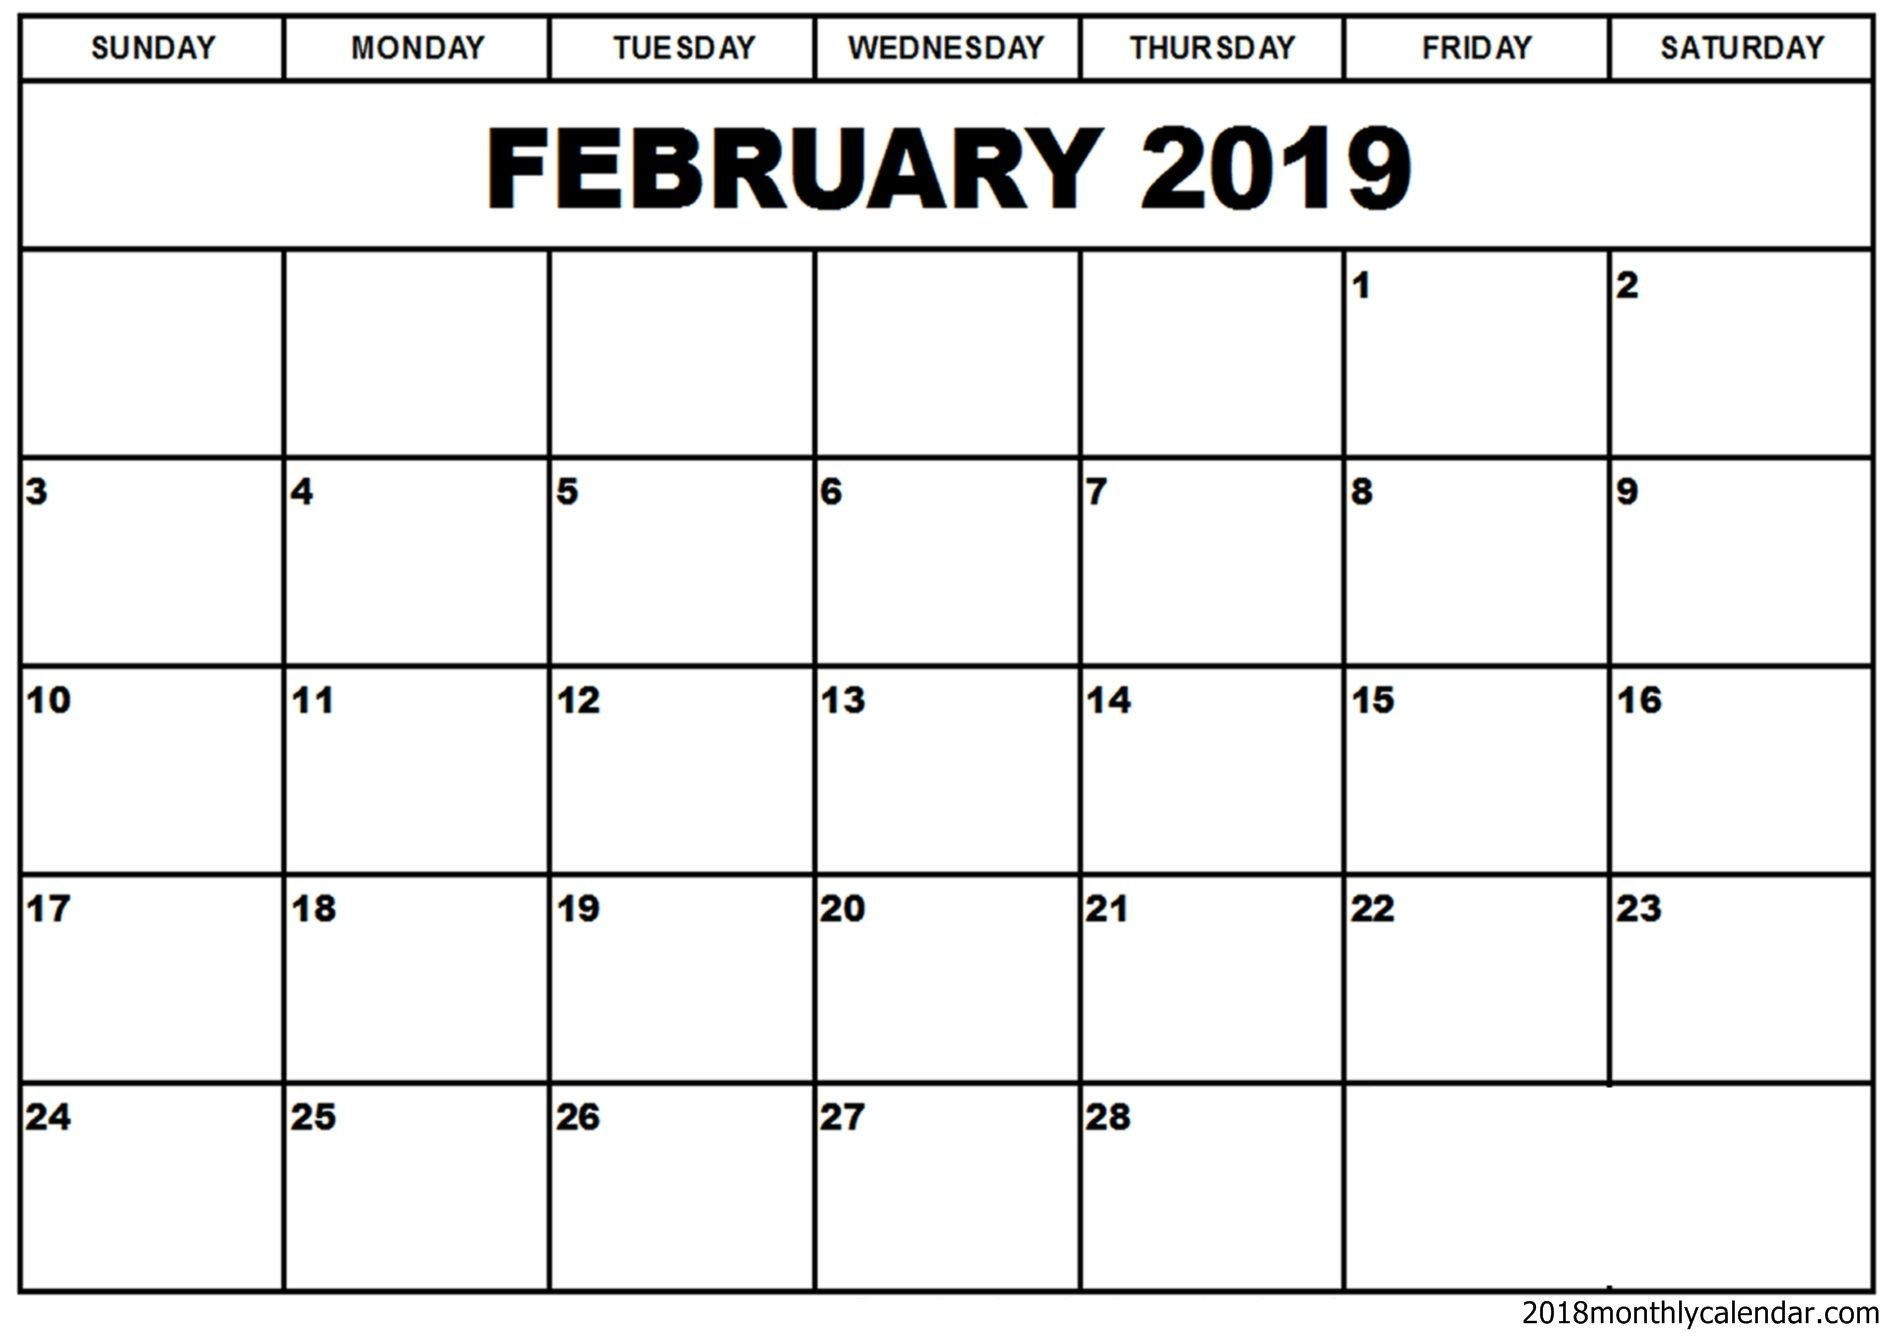 February 2019 Calendar Word Template   Free Printable Monthly Calendar 2019 Template Word